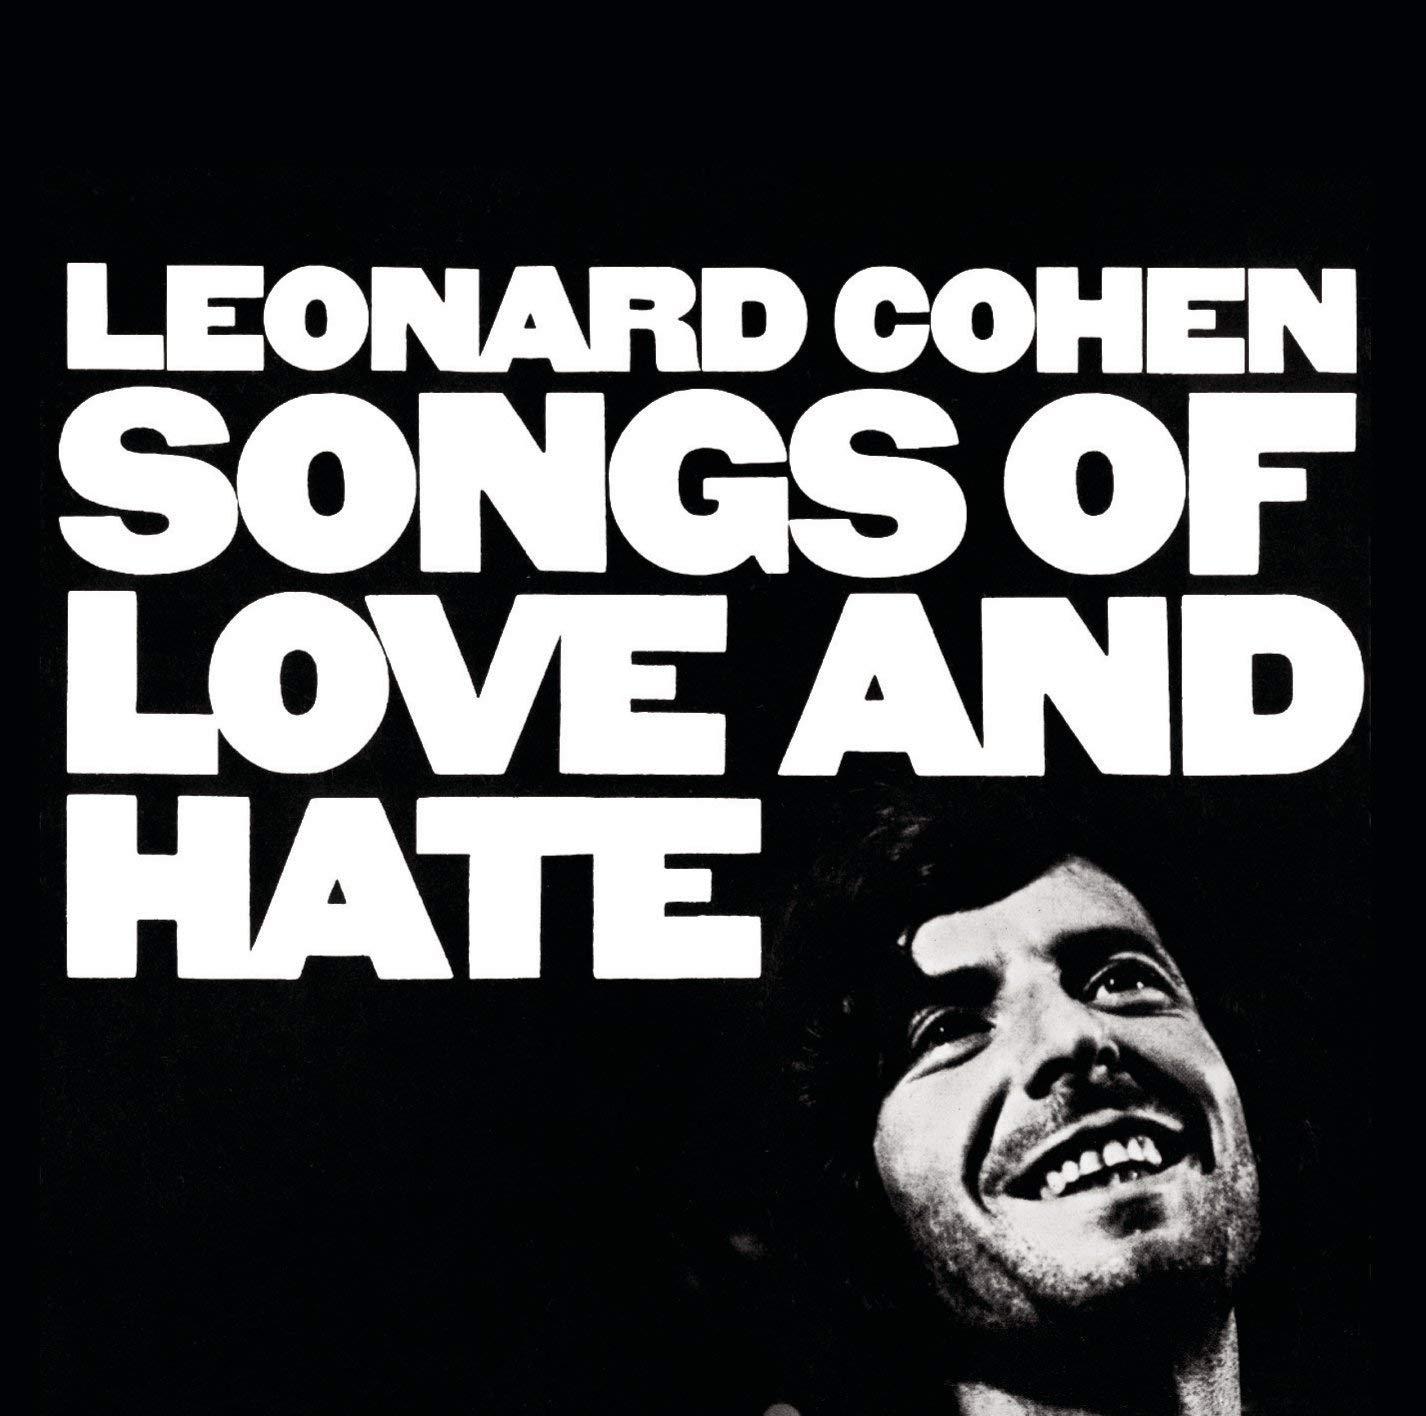 LEONARD COHEN   Songs of Love and Hate, 1970, Bob Johnston, 44:21